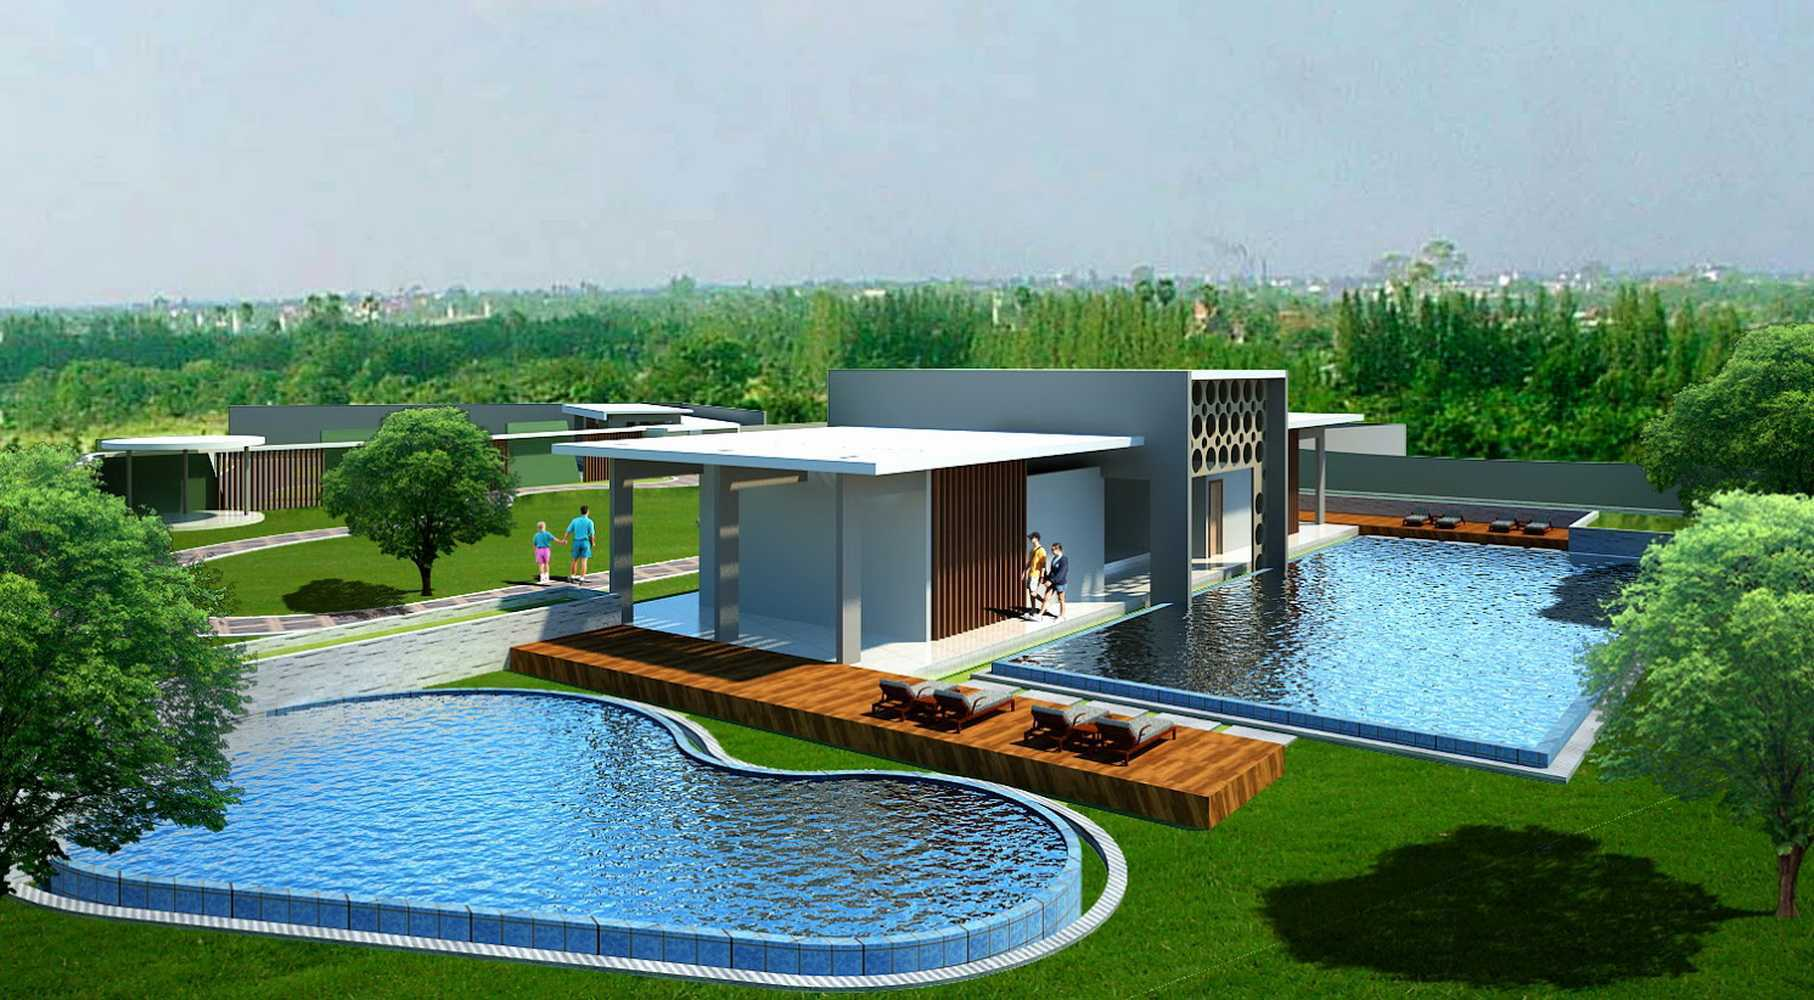 Ardiansyah Basha Clubhouse Modernhill  Pondok Cabe Udik, Pamulang, South Tangerang City, Banten 15418, Indonesia  Back View   32354